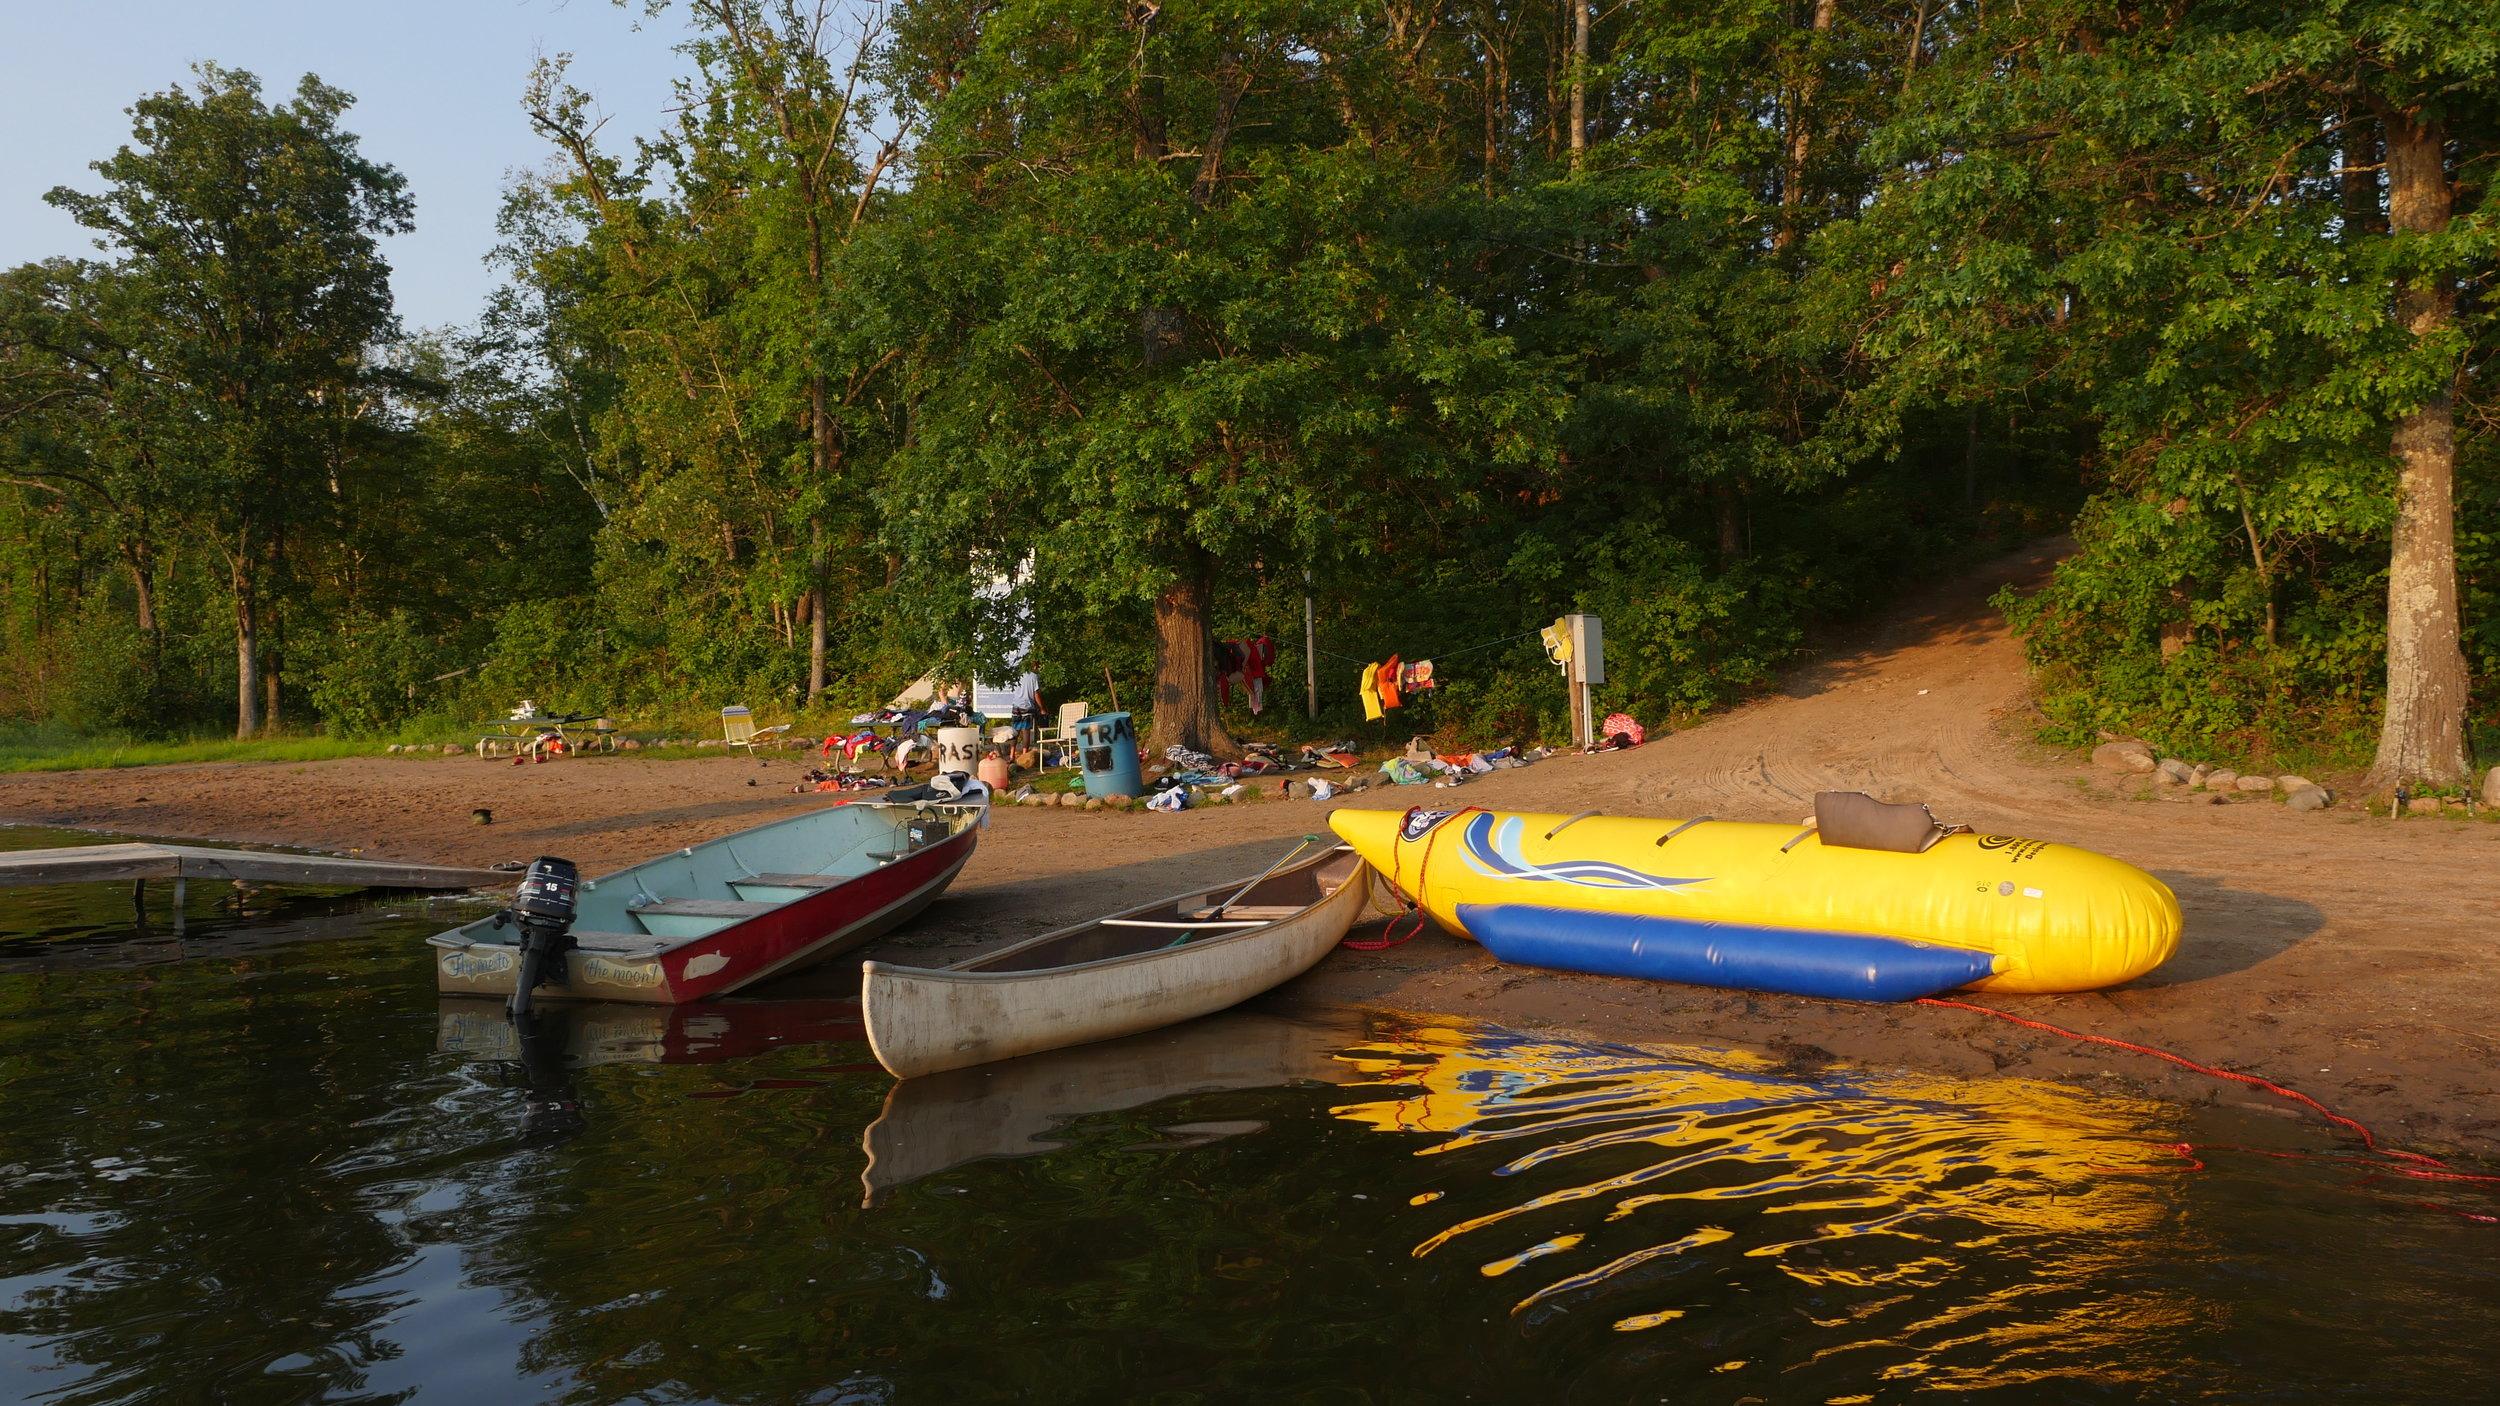 Minnesota-Lake-and-Boats.JPG